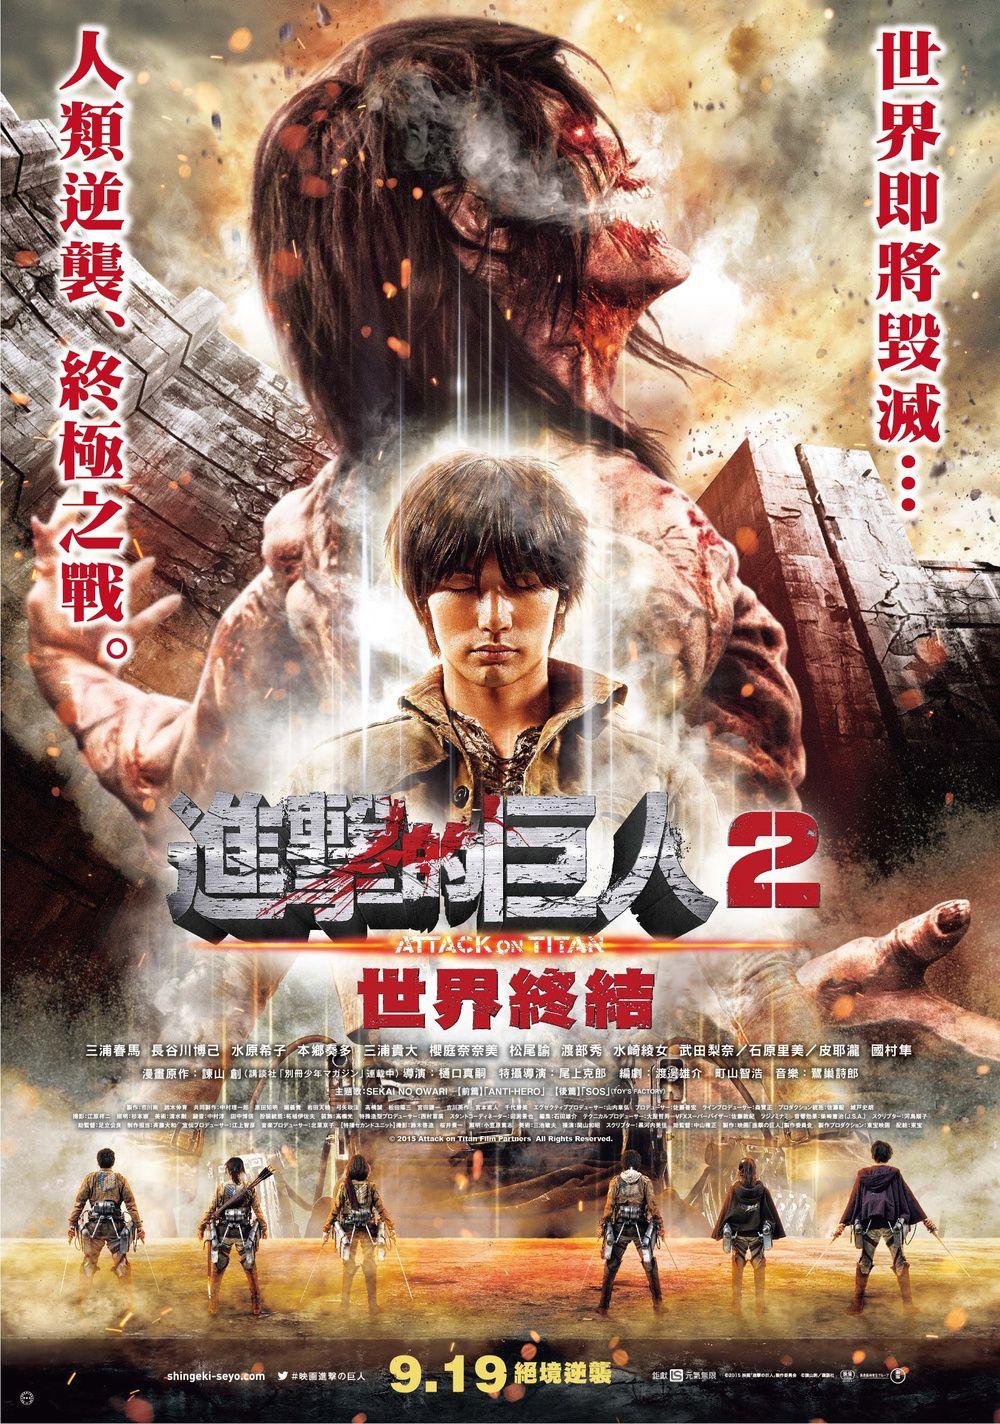 進擊之巨人:世界終結 Attack on titan 2, Attack on titan, Watch